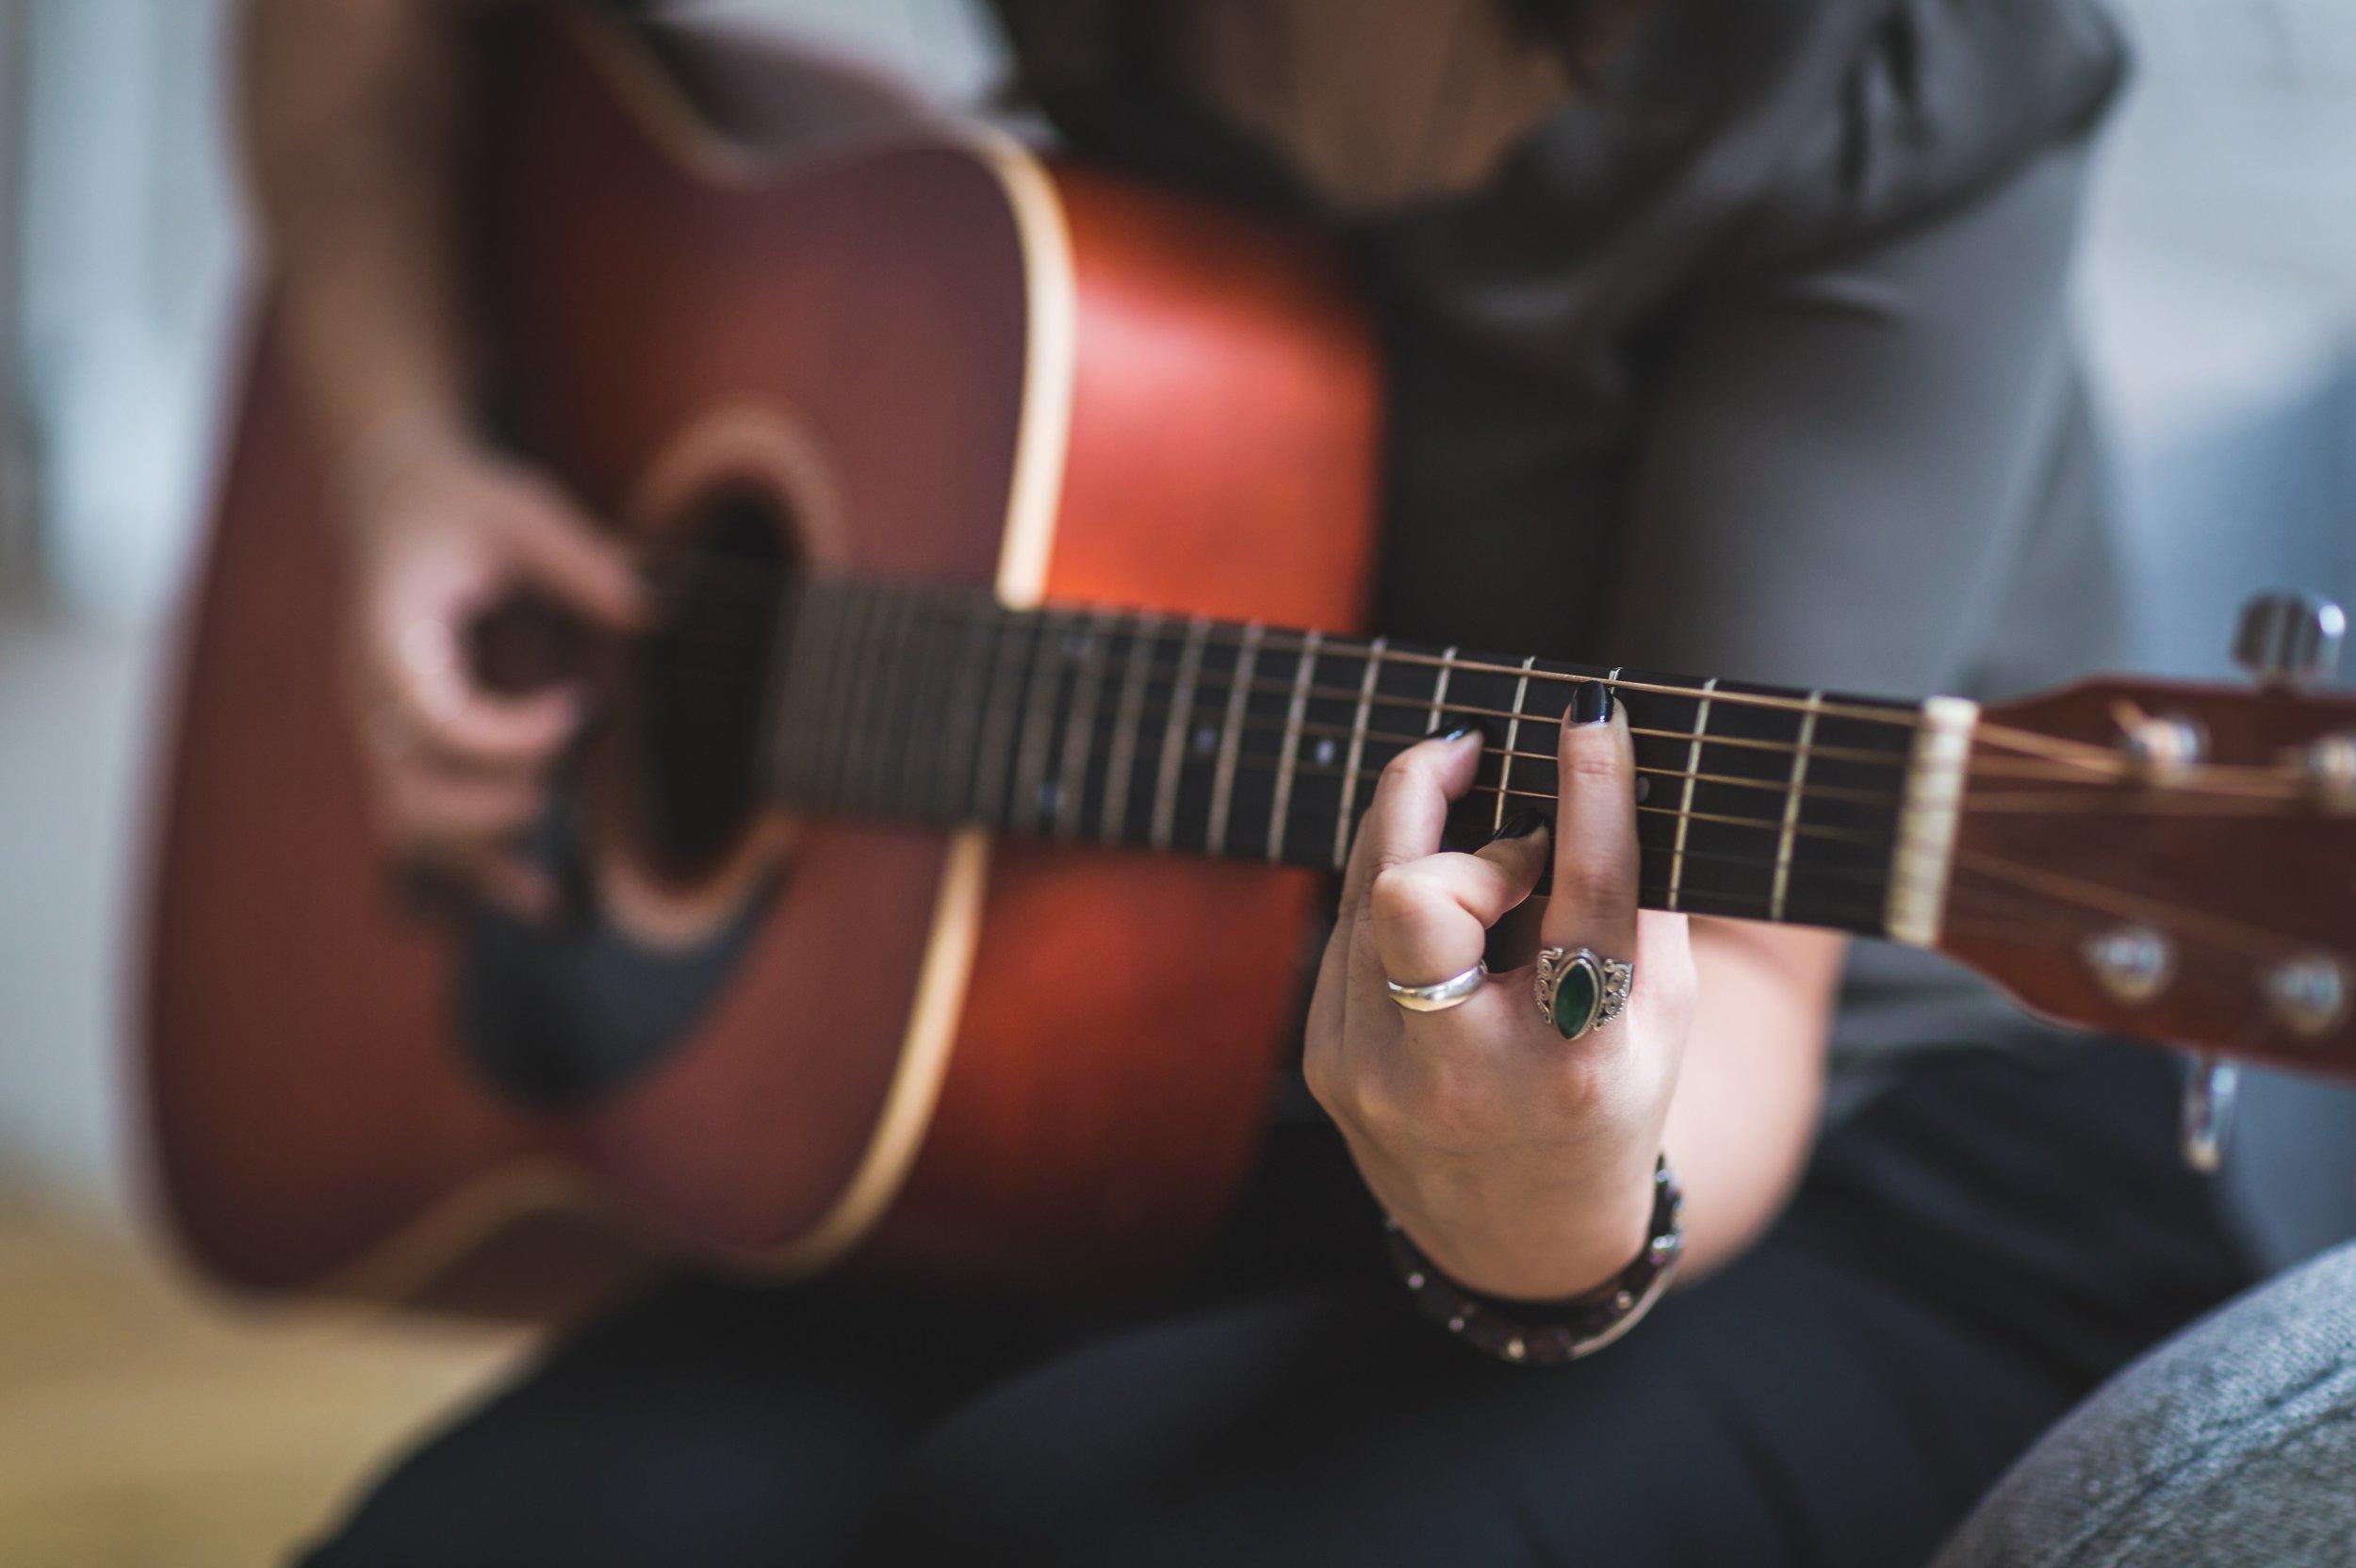 woman-playing-guitar_4460x4460.jpg